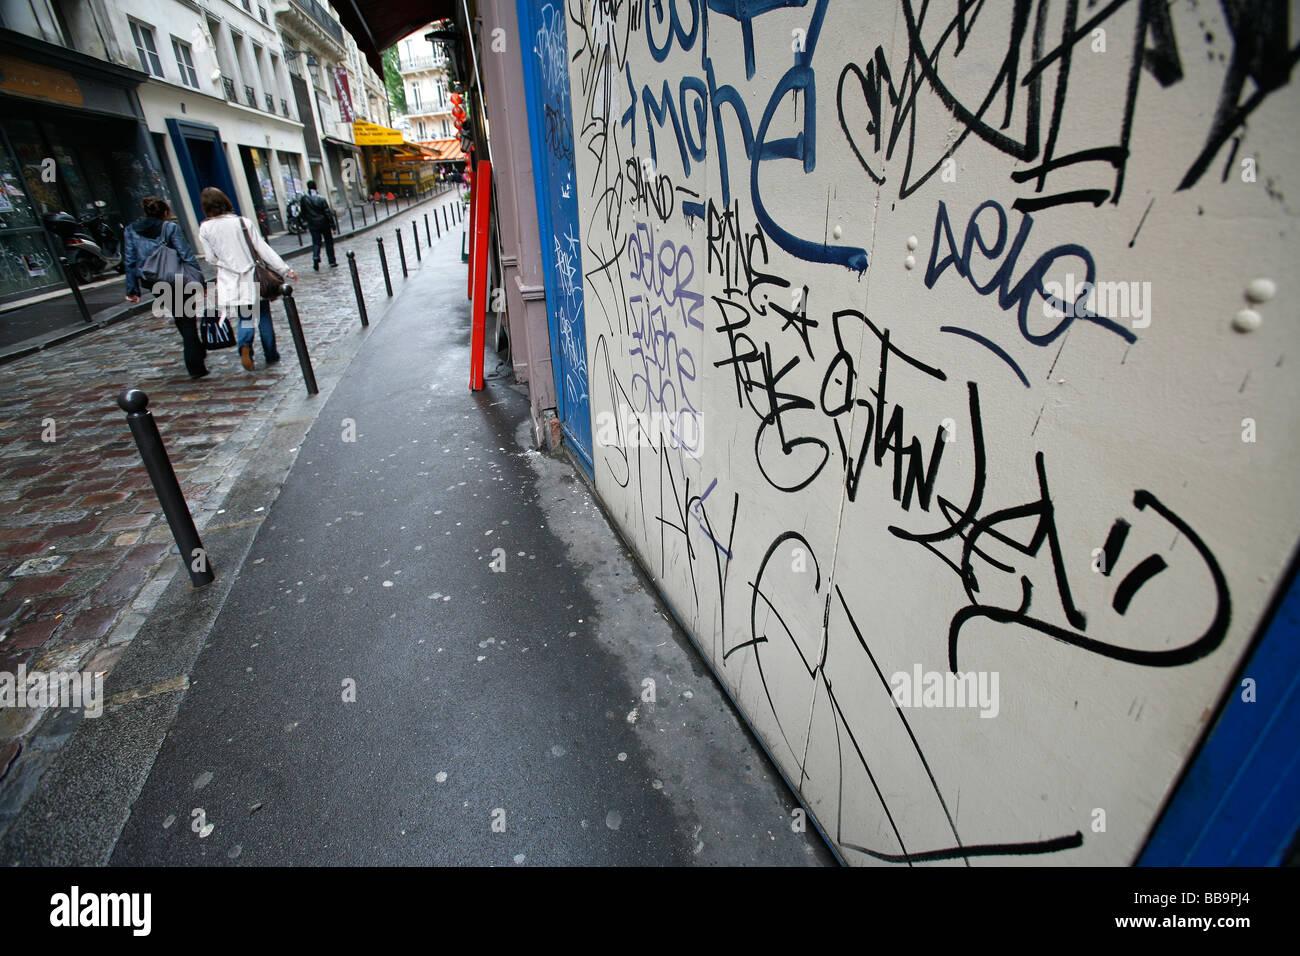 graffiti, Paris Left Bank - Stock Image